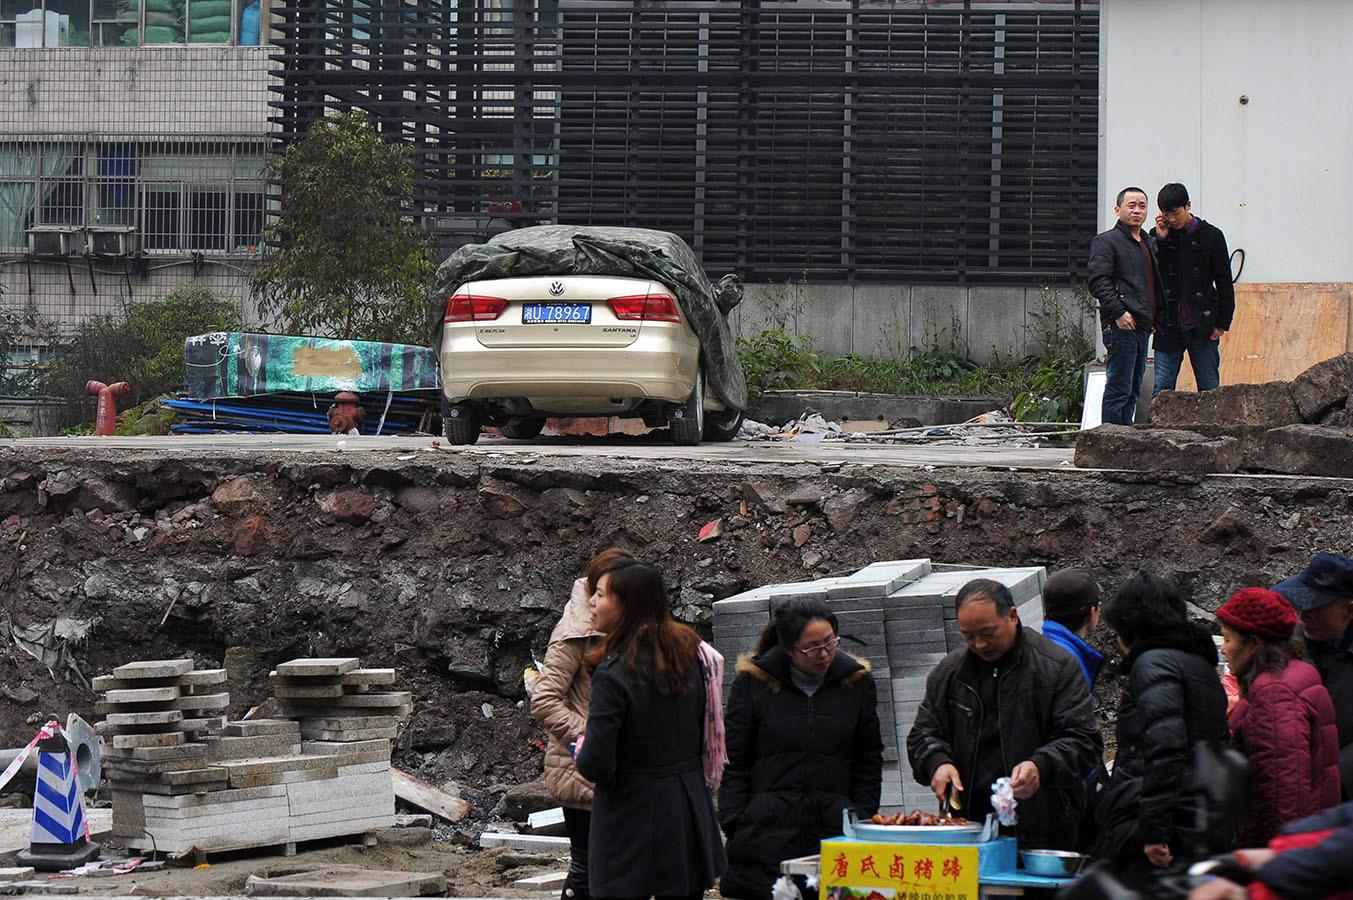 Trouble finding a space? Motorist finds vehicle stranded after car park demolition